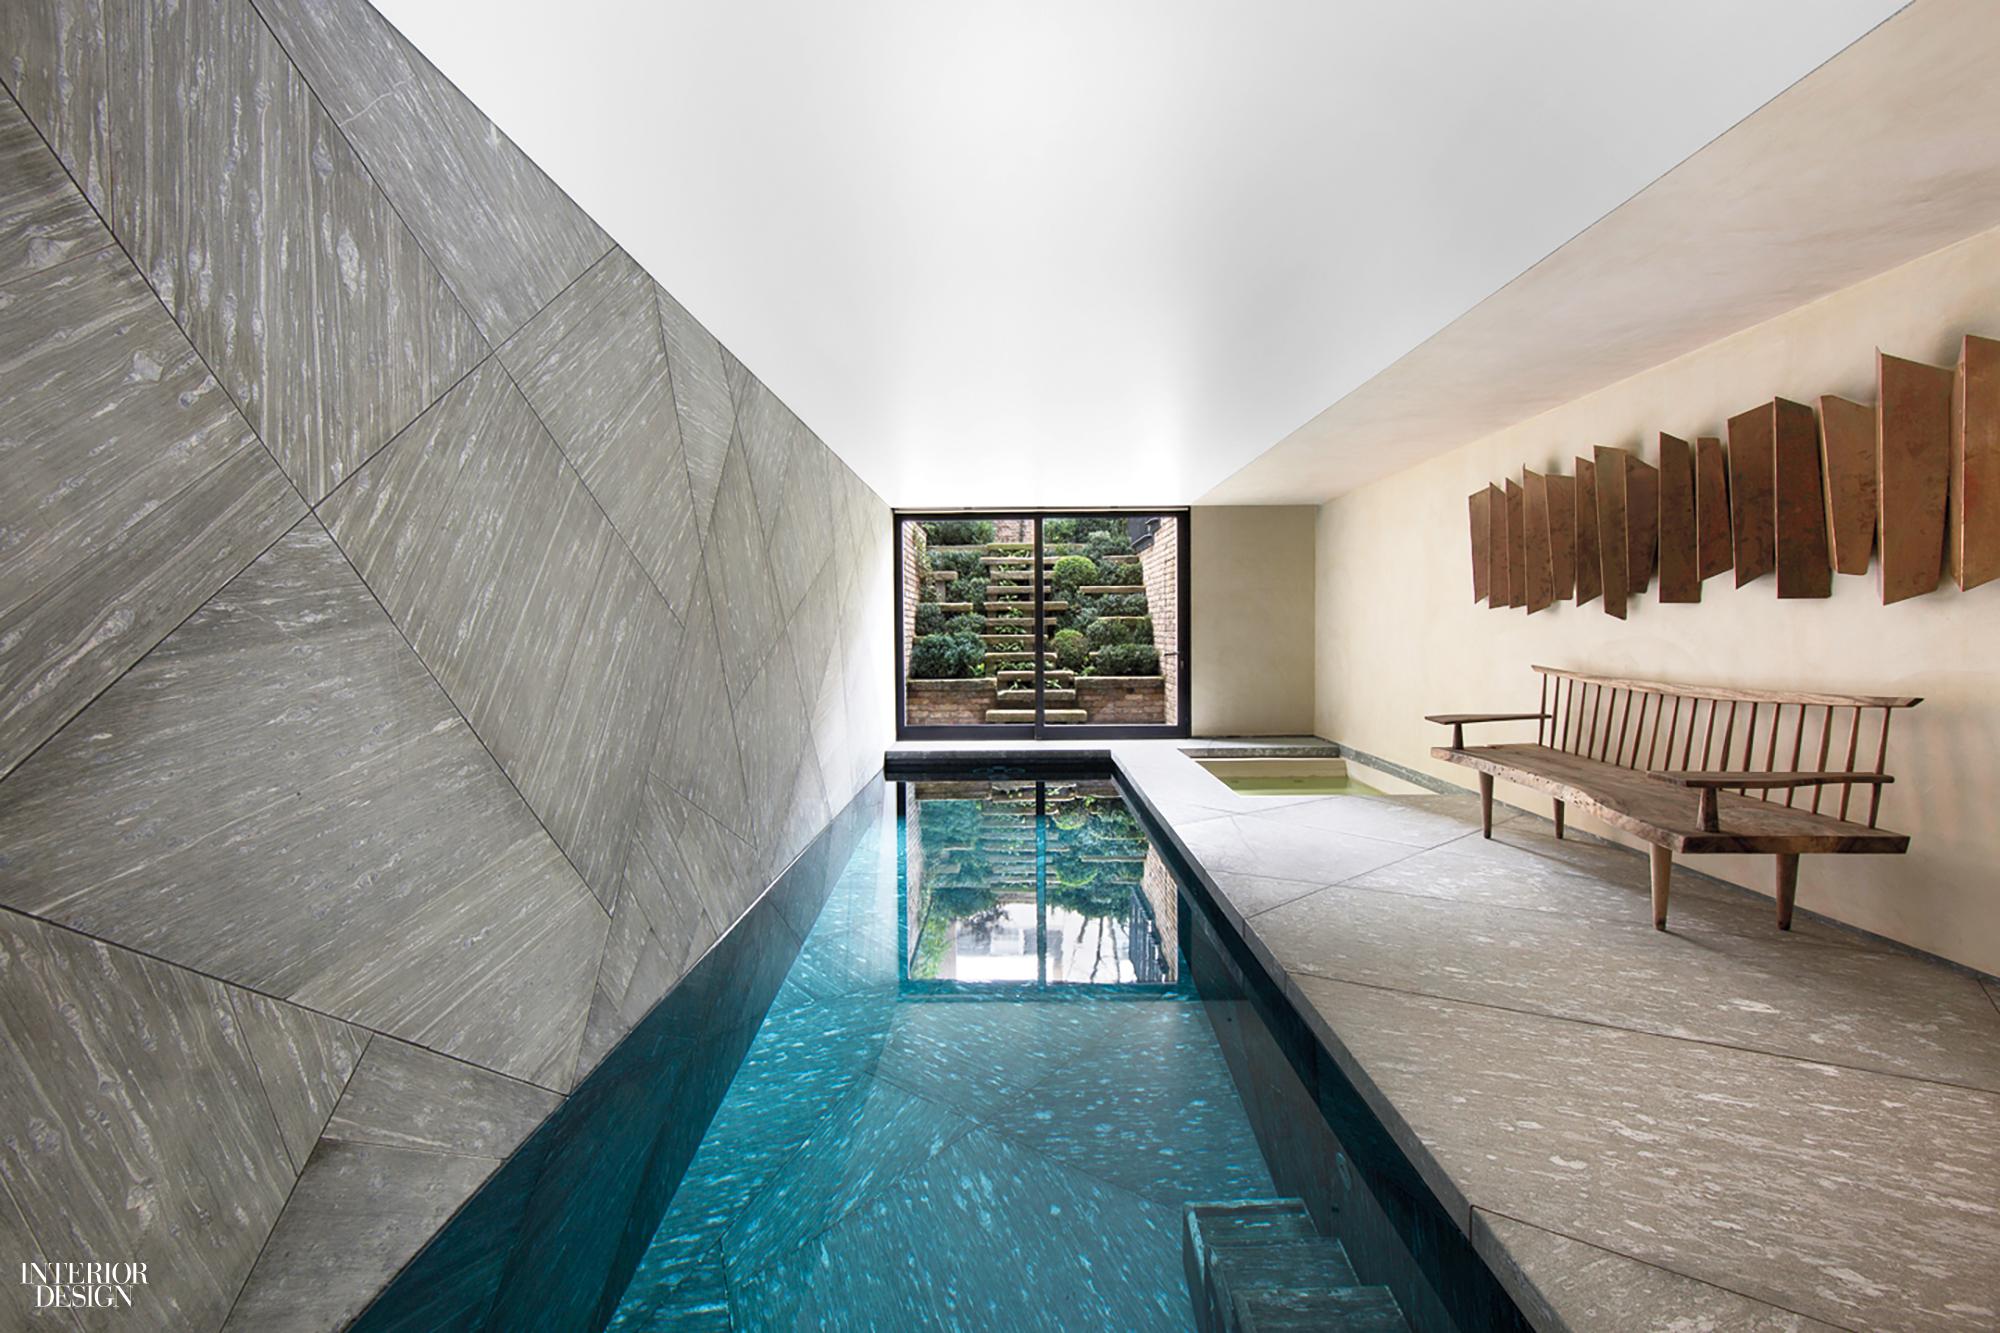 7 Simply Amazing Indoor Pools